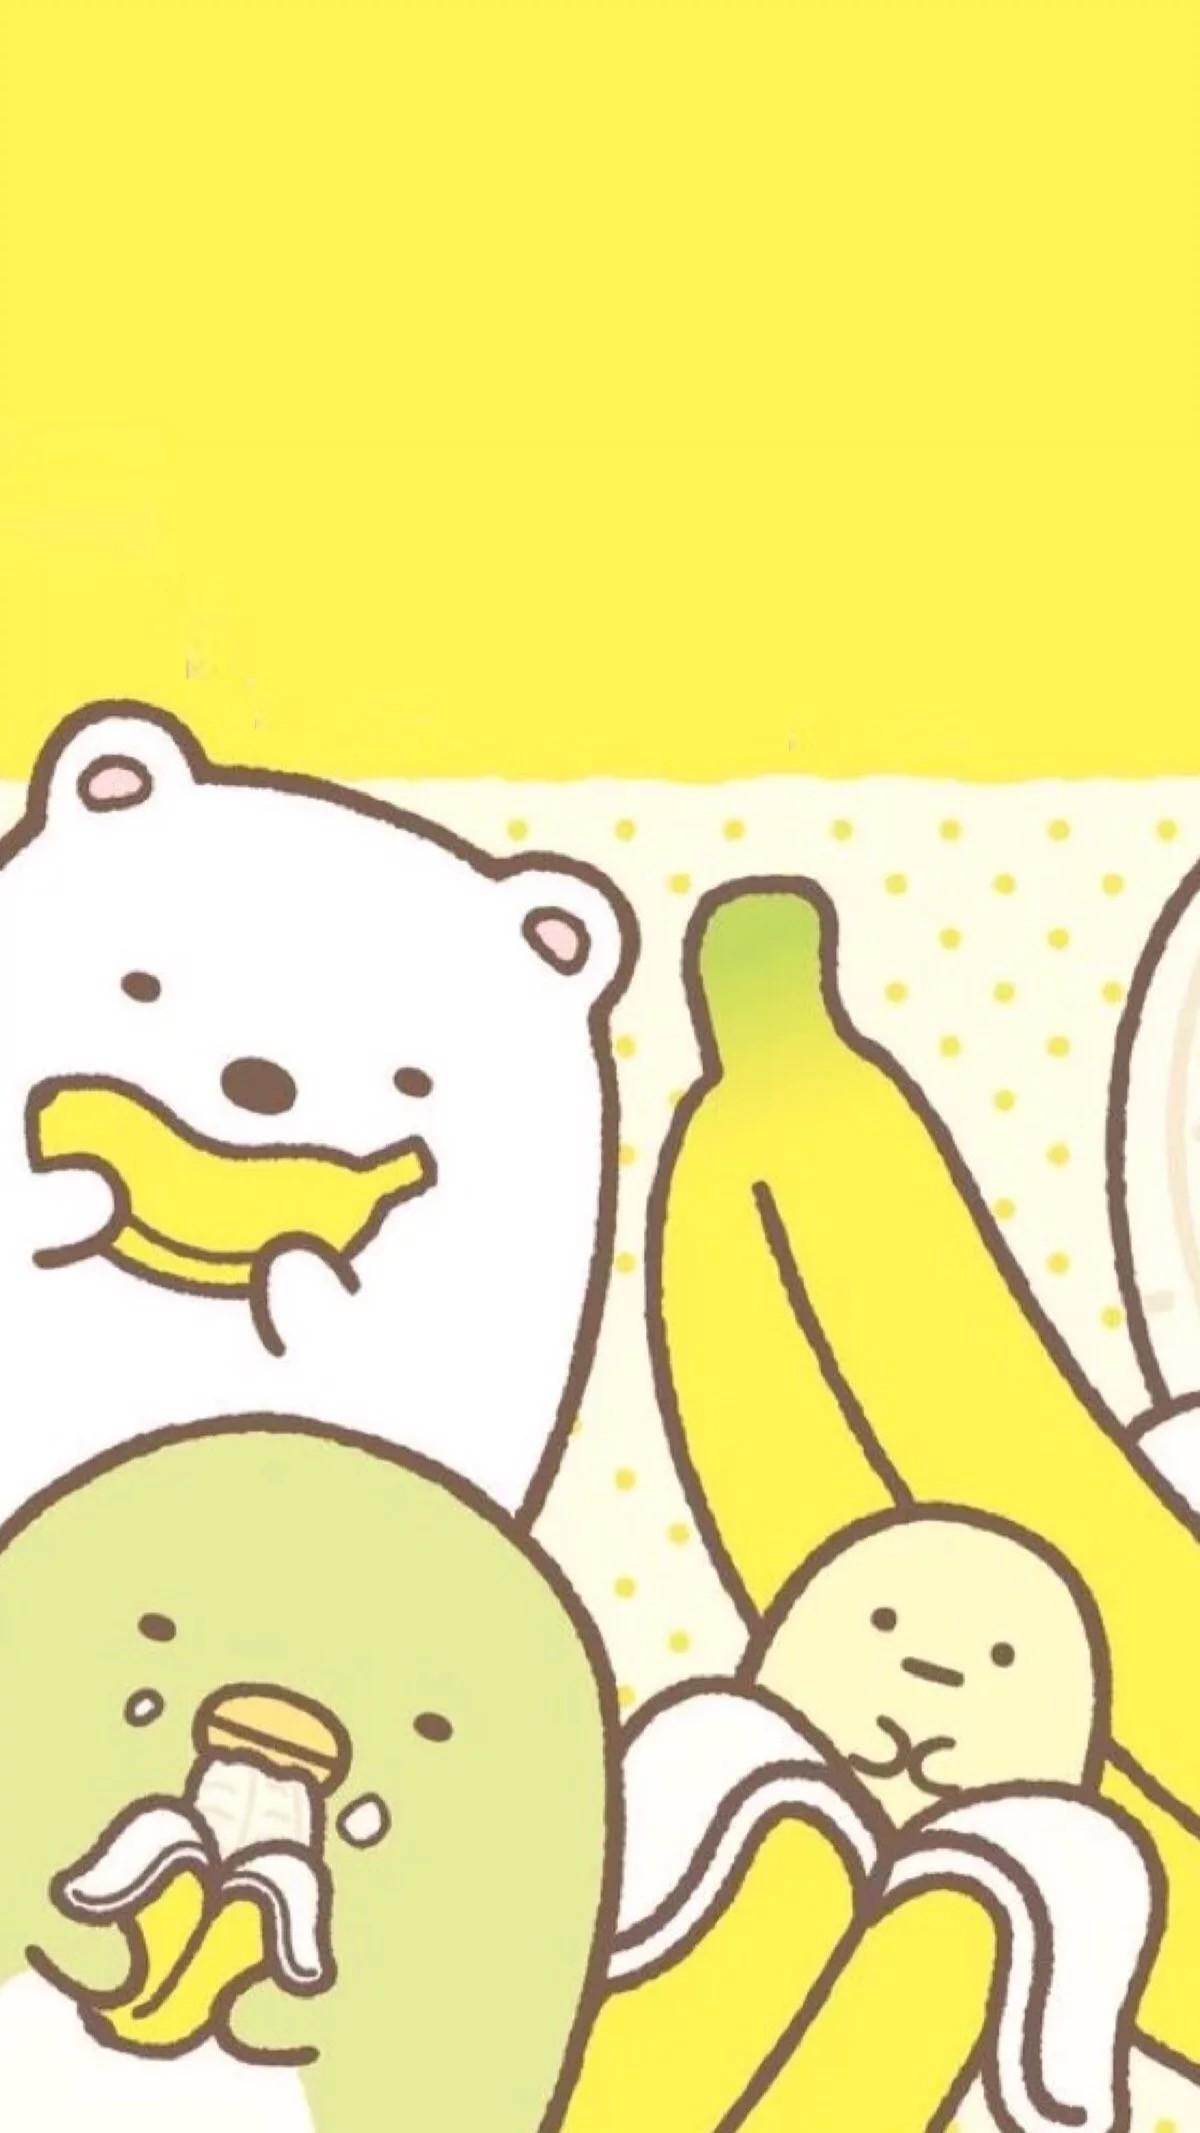 Fantastic Wallpaper Hello Kitty Bear - 1075581-download-free-sanrio-background-1200x2133  Snapshot_69932.jpg